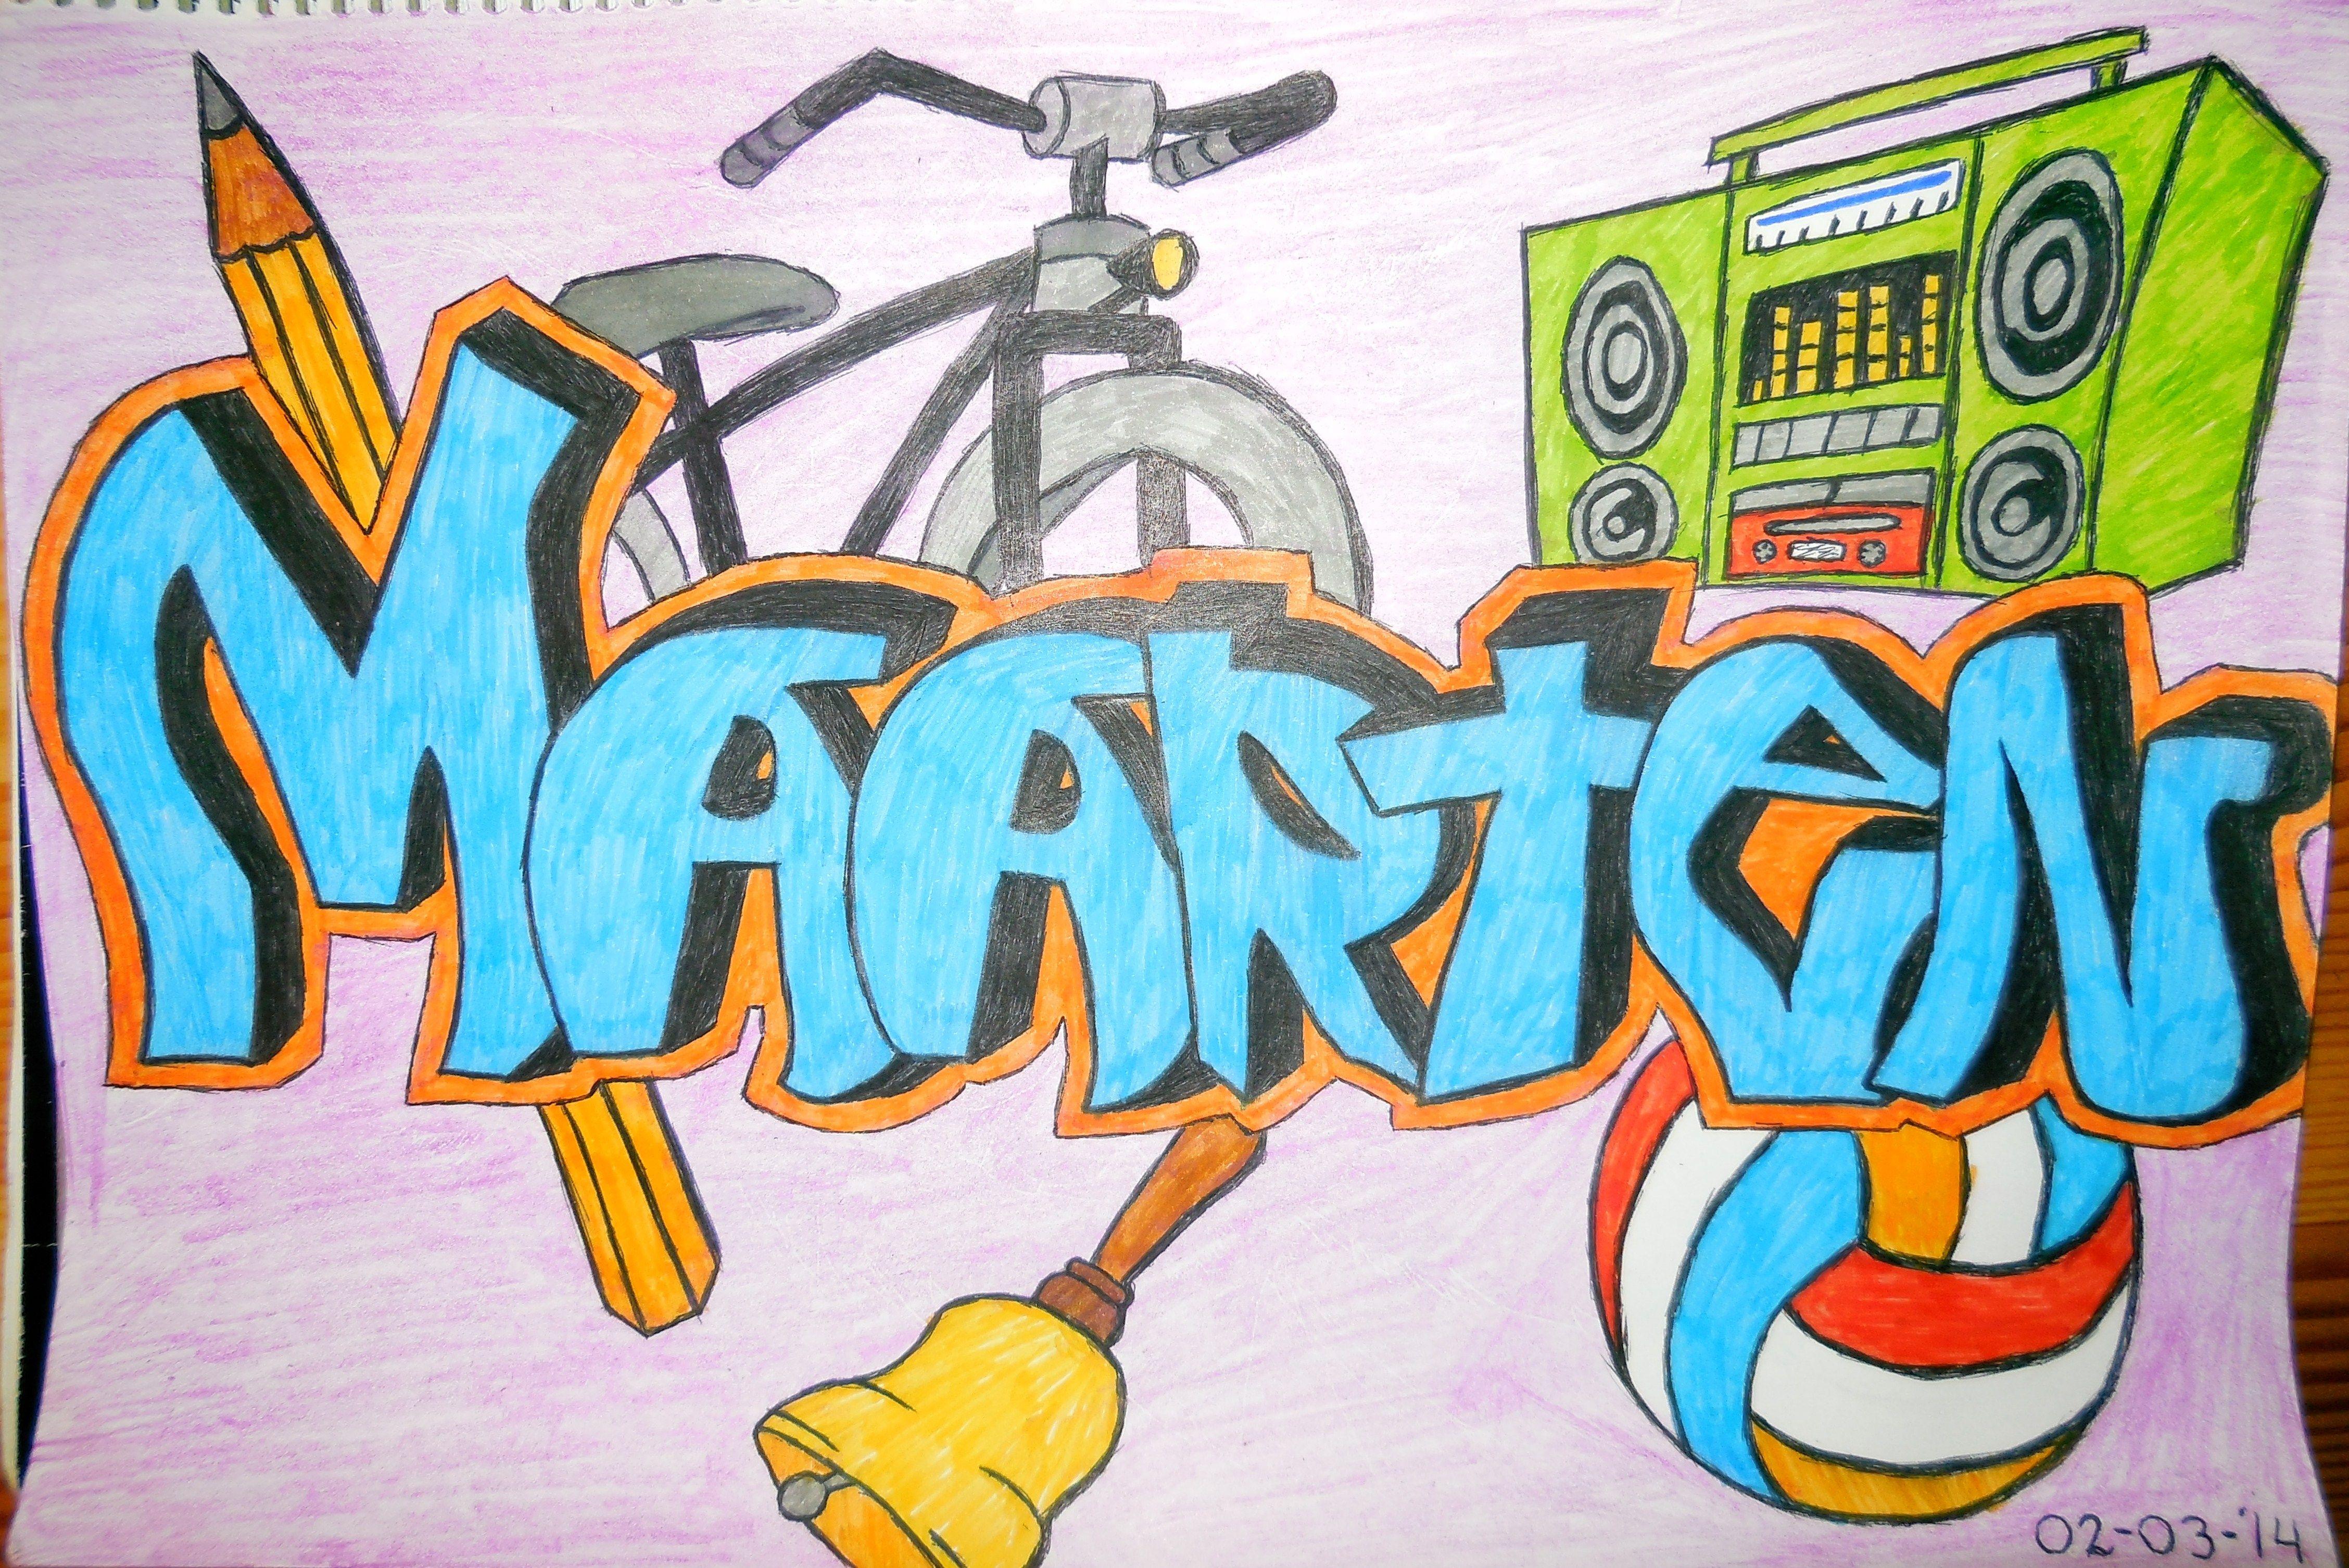 Magnifiek Graffiti-tekenen - Je naam in graffitistijl leren tekenen #IZ46